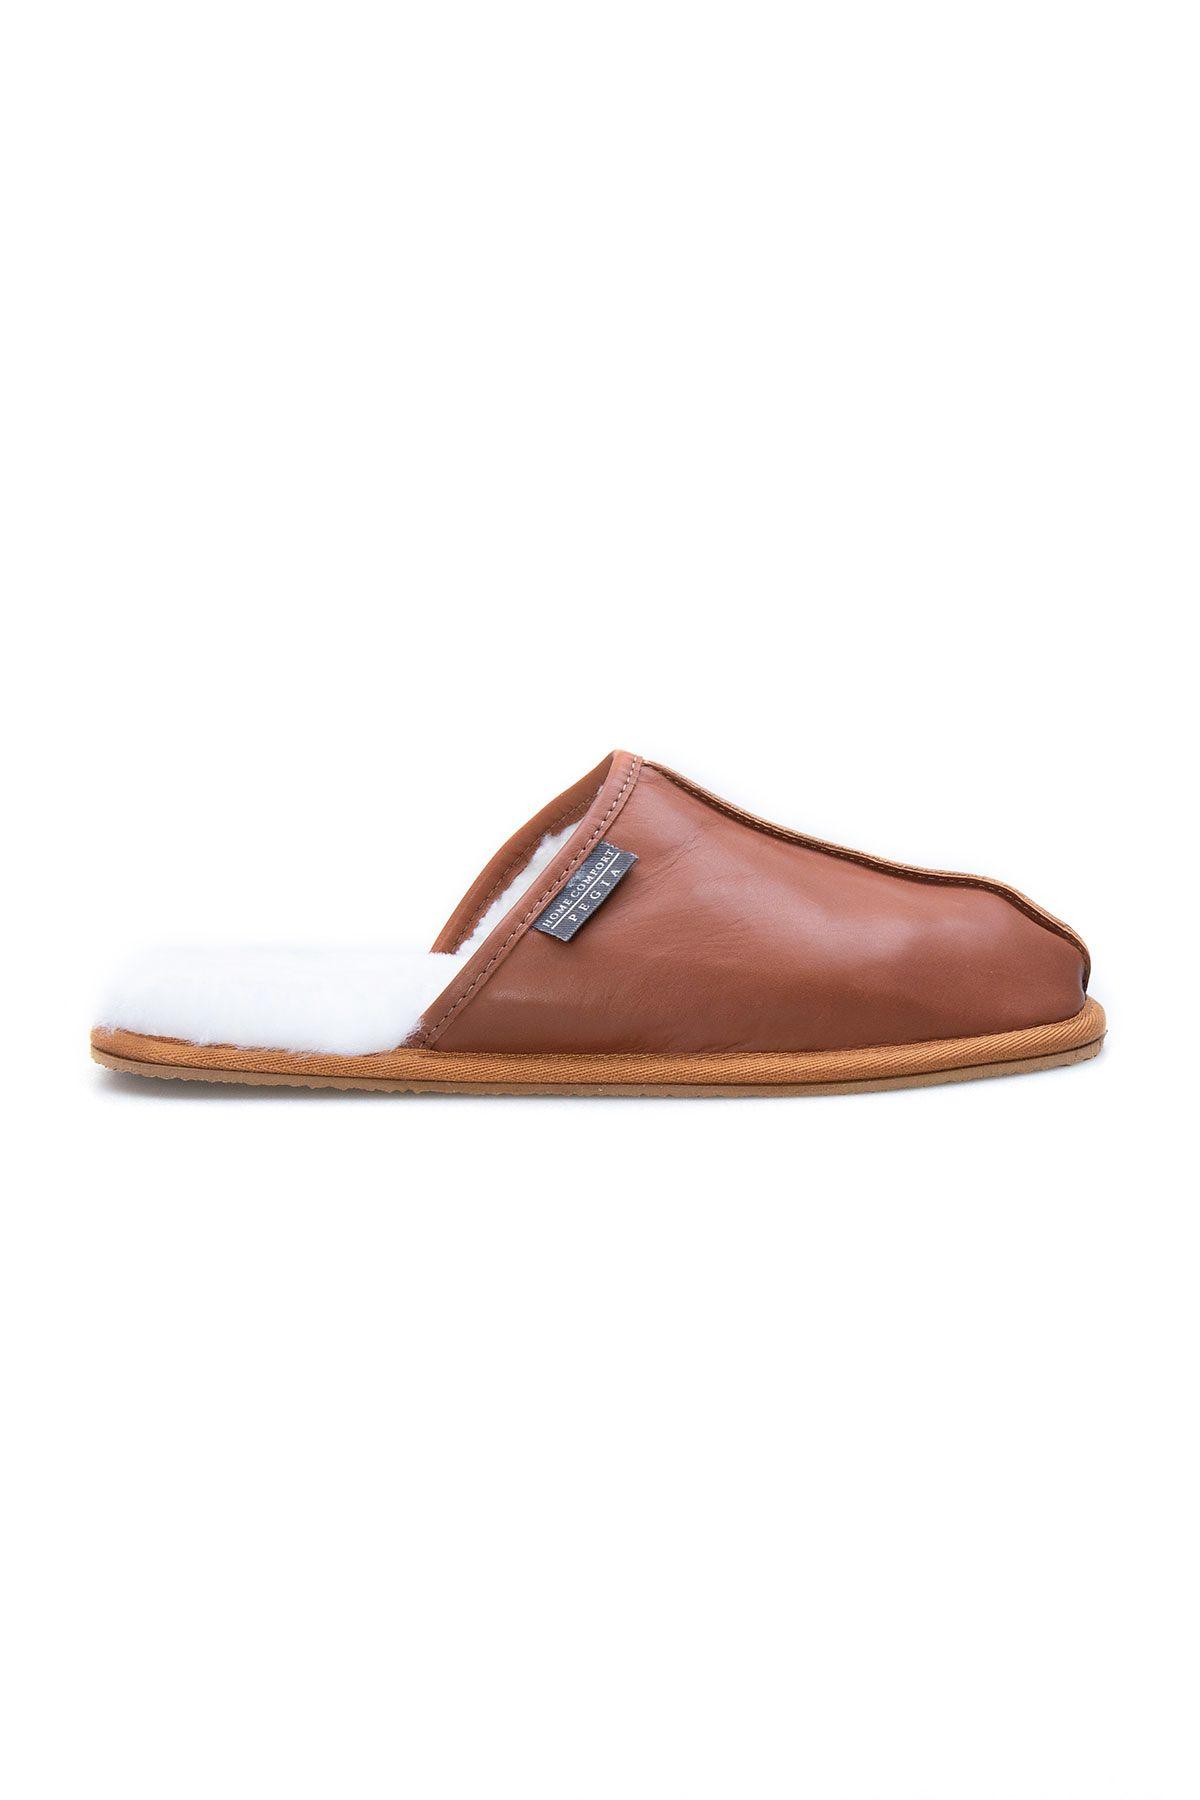 Pegia Genuine Leather Men's House Slippers 111012 Ginger